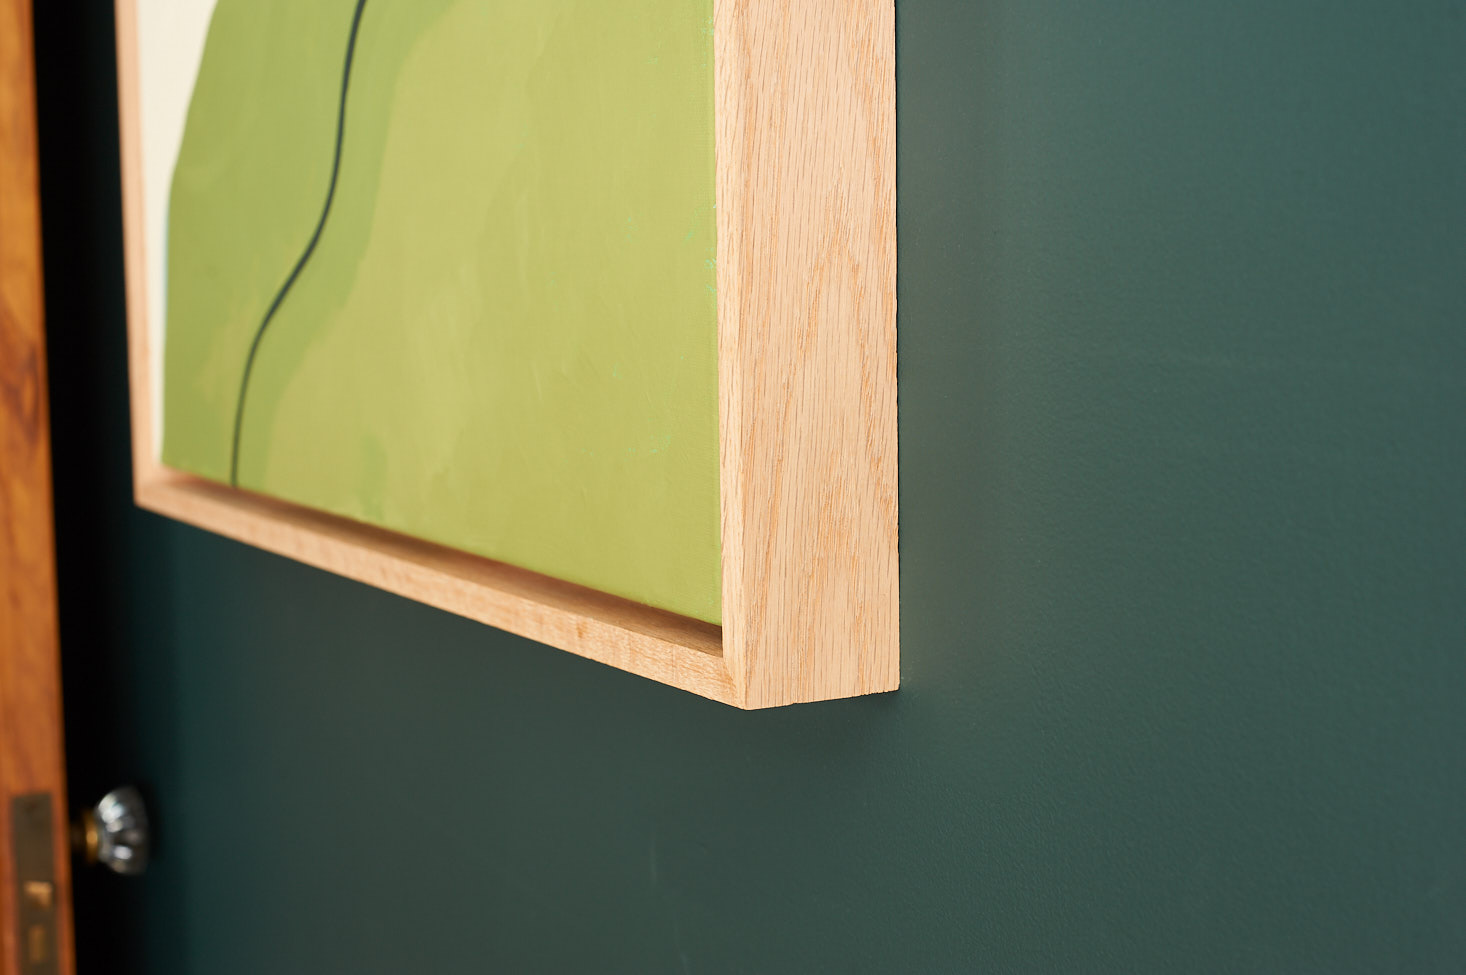 floating frame for canvas DIY Wood Canvas Float Frame | The Sweet Beast floating frame for canvas